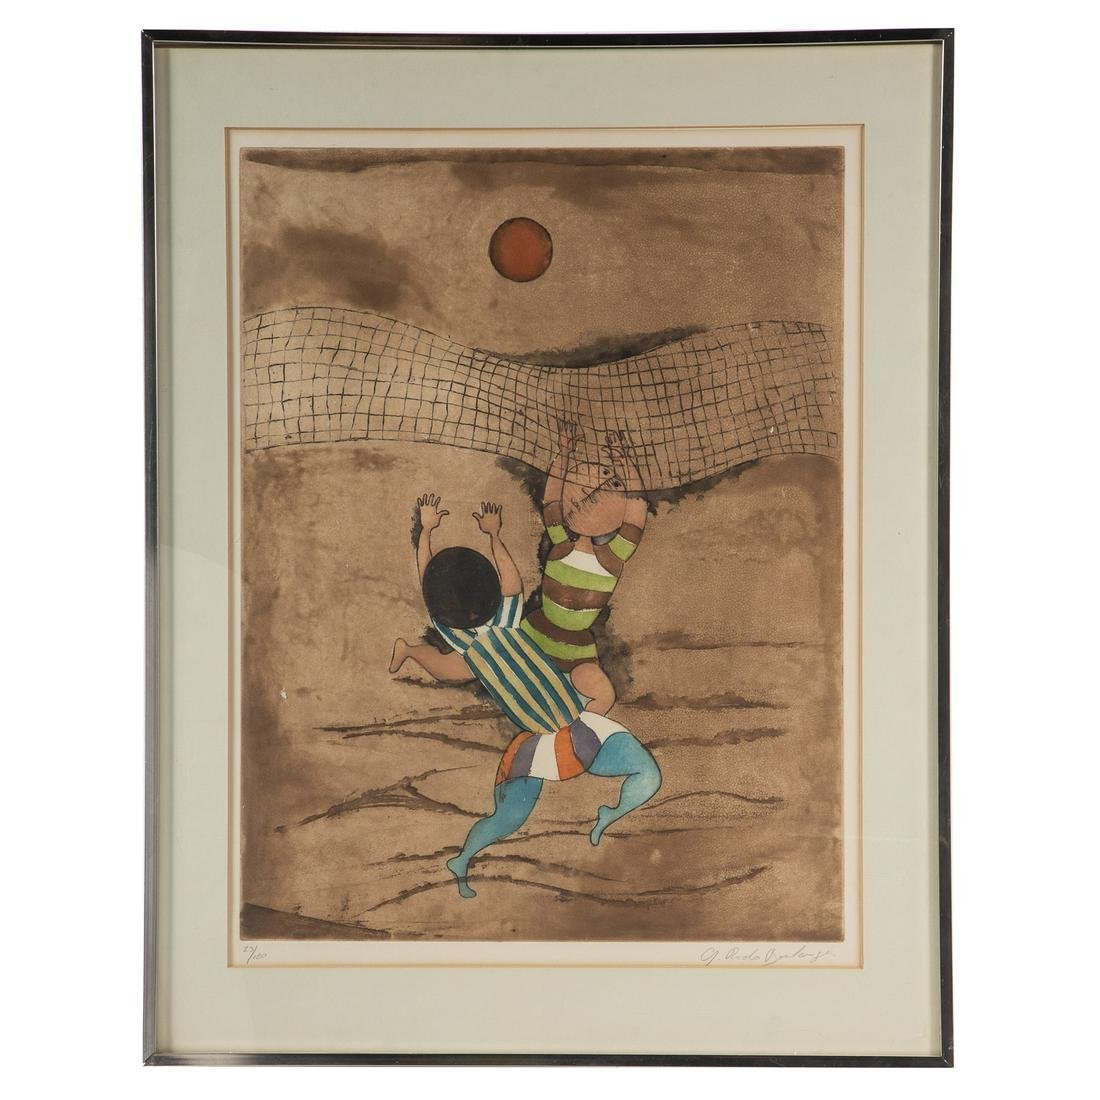 Graciela Rodo Boulanger. Volleyball Players